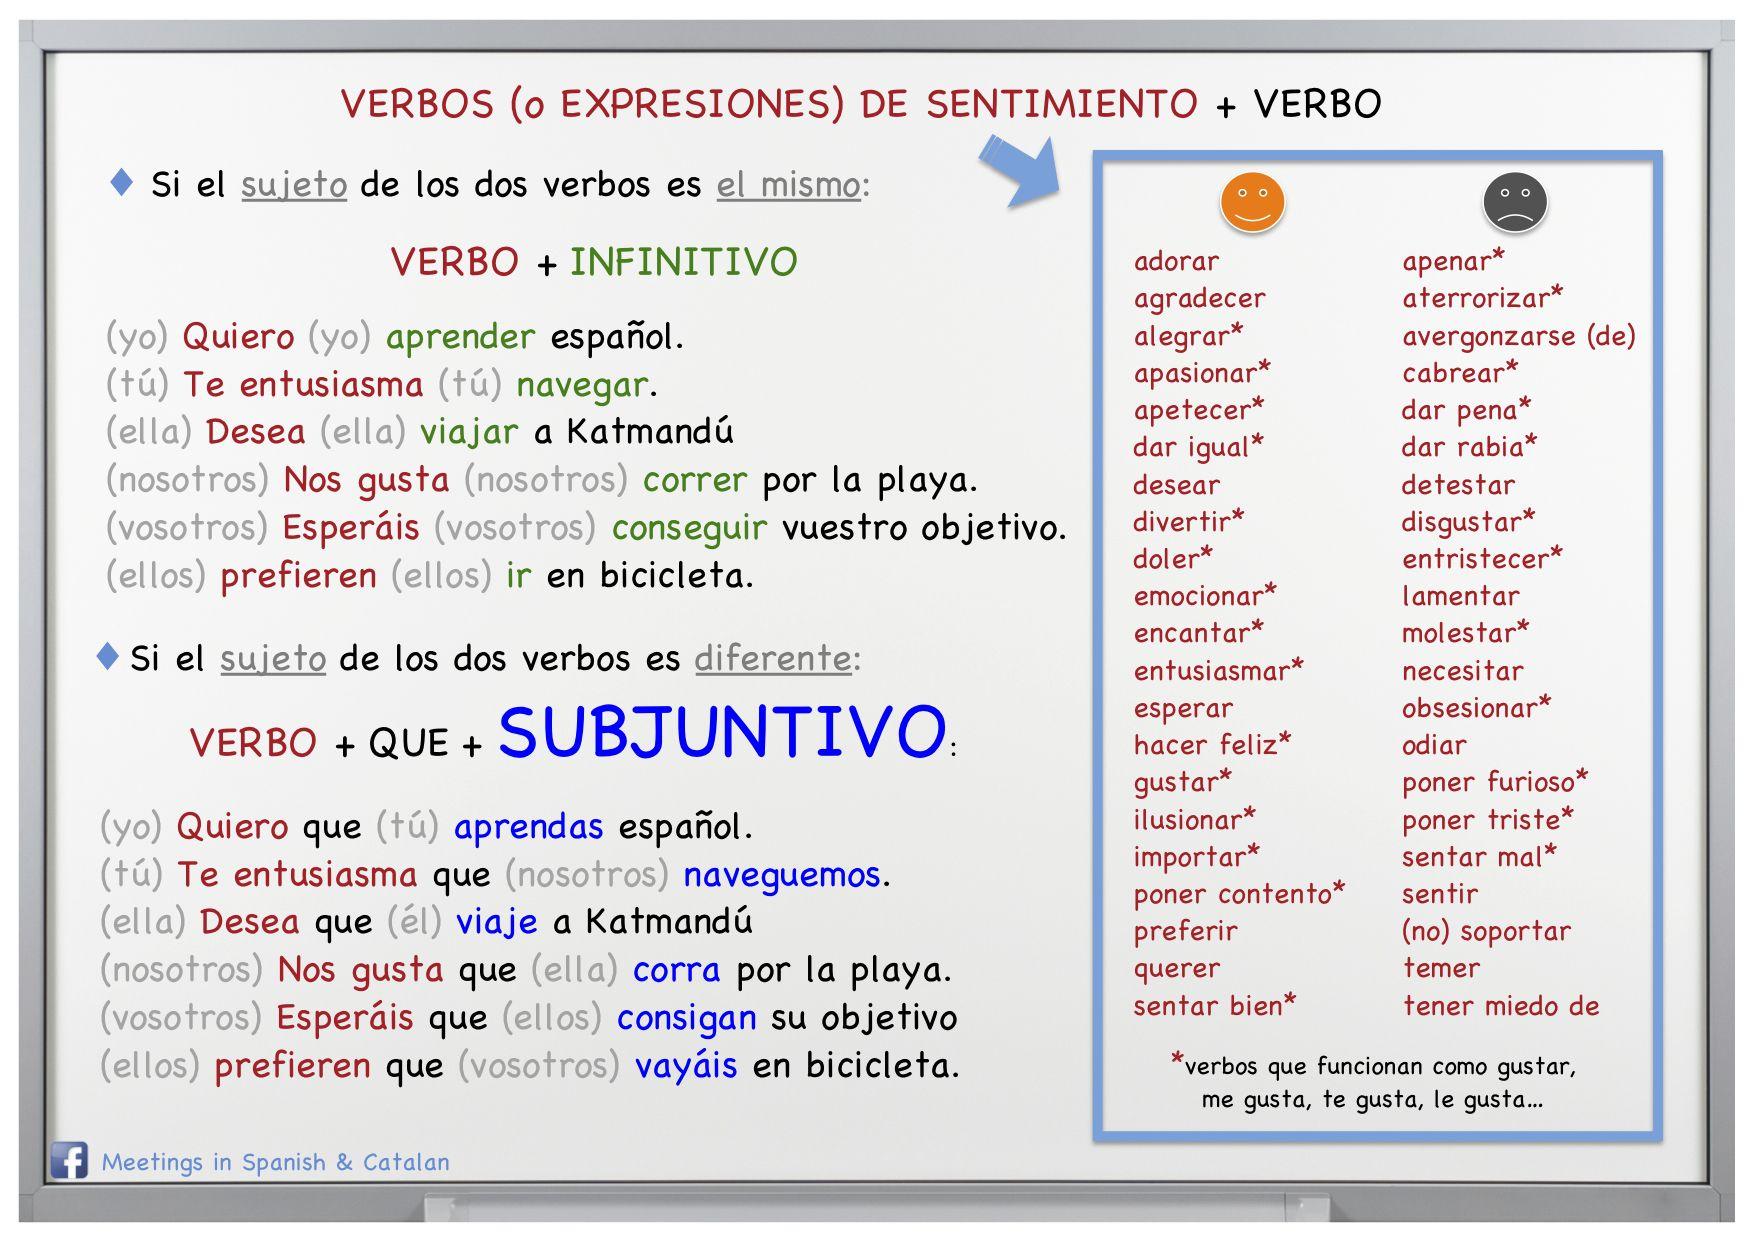 Welcome To Facebook Log In Sign Up Or Learn More Grammaire Espagnole Langue Espagnole Espagnol Apprendre